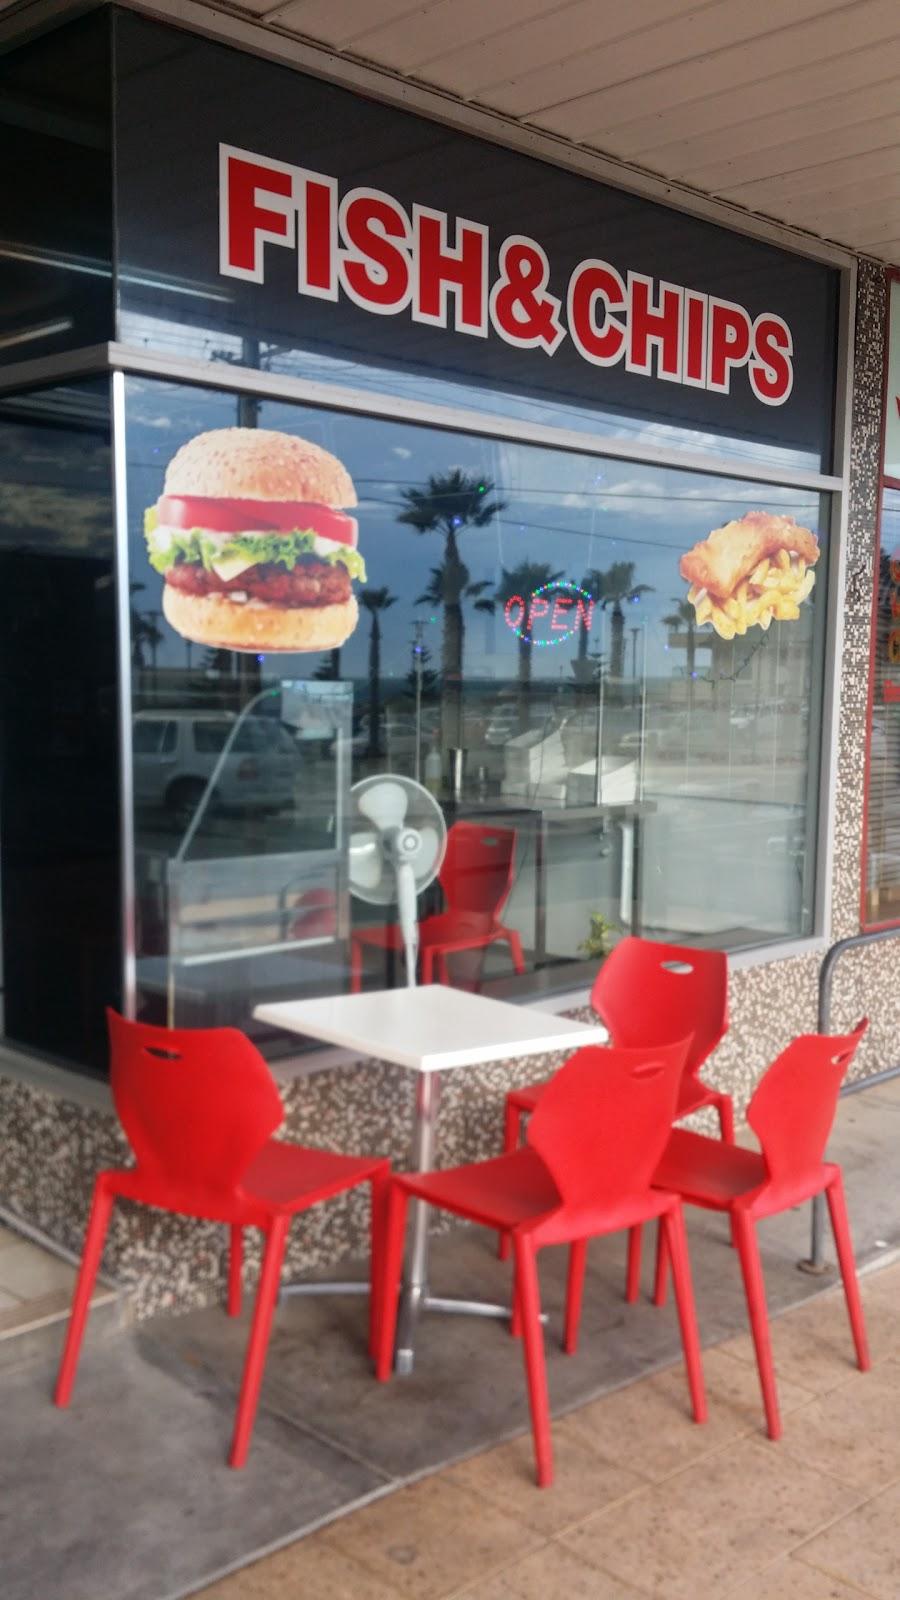 Grange Fish&Chips   cafe   590 Seaview Rd, Grange SA 5022, Australia   0423033873 OR +61 423 033 873